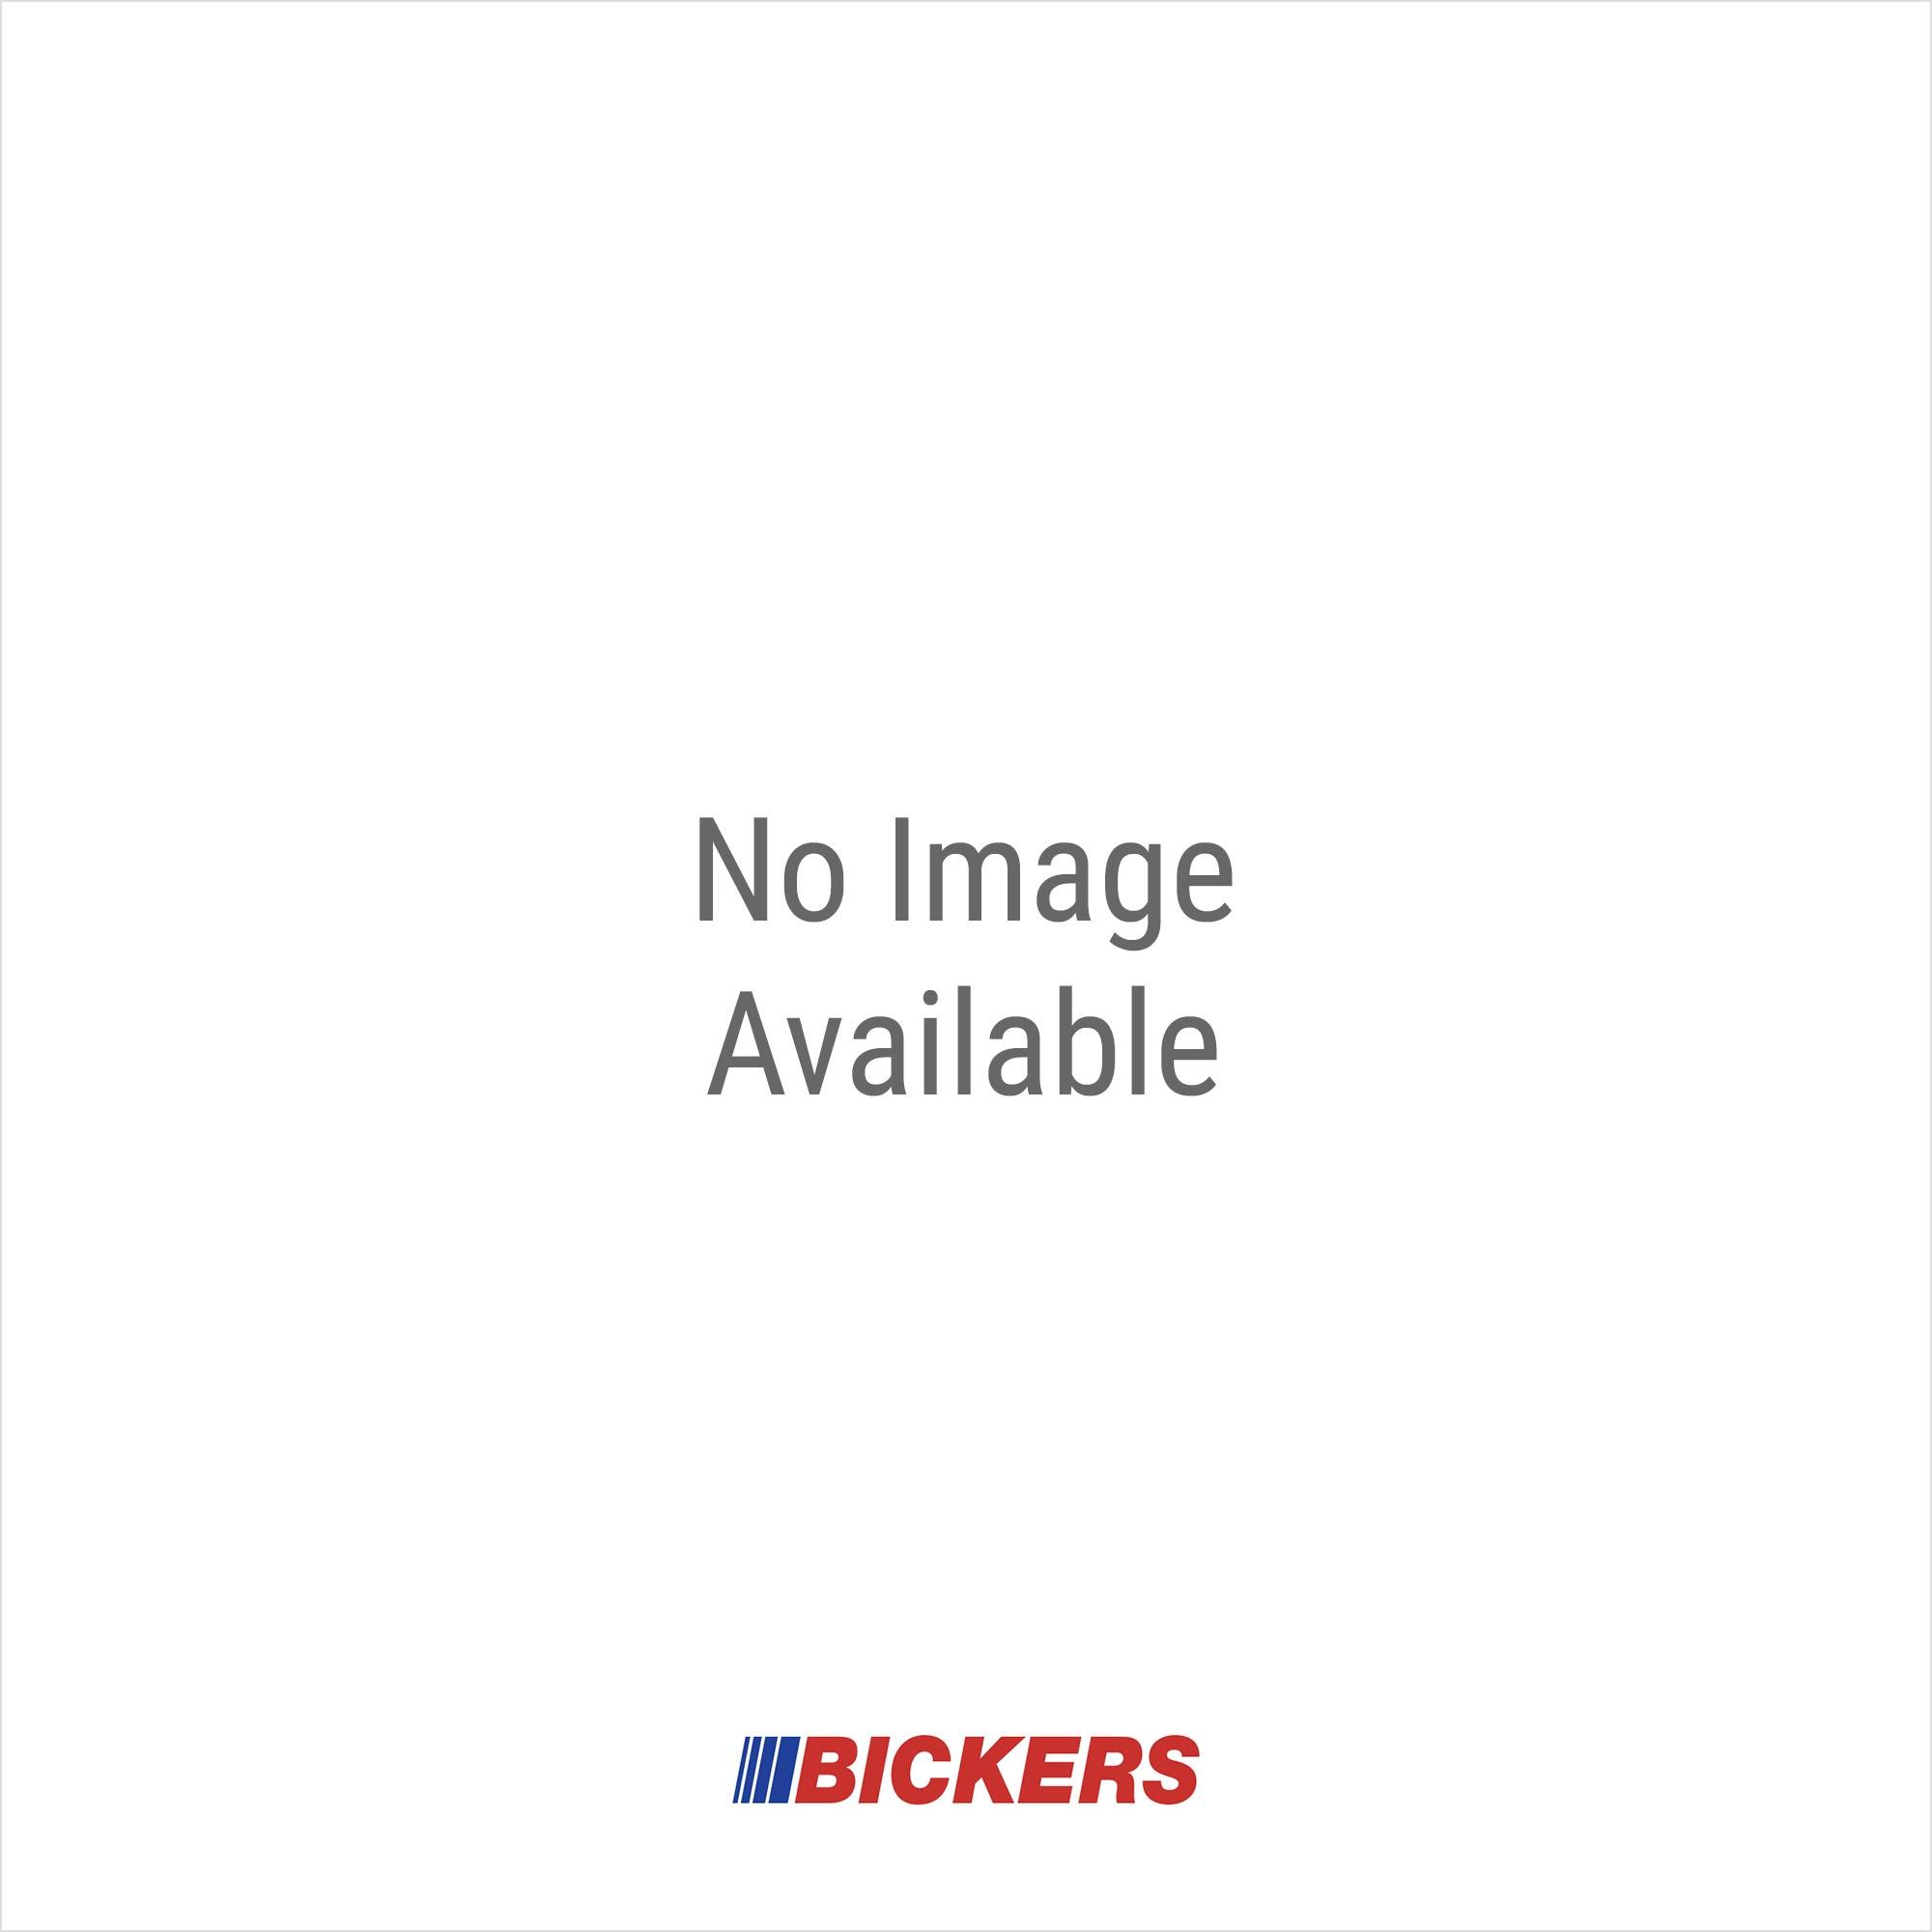 NEW 12V MOTOR RAMSEY WINCH BI-DIRECTIONAL 2.5HP MBJ4202 MBJ4204 45-8094 46-2283